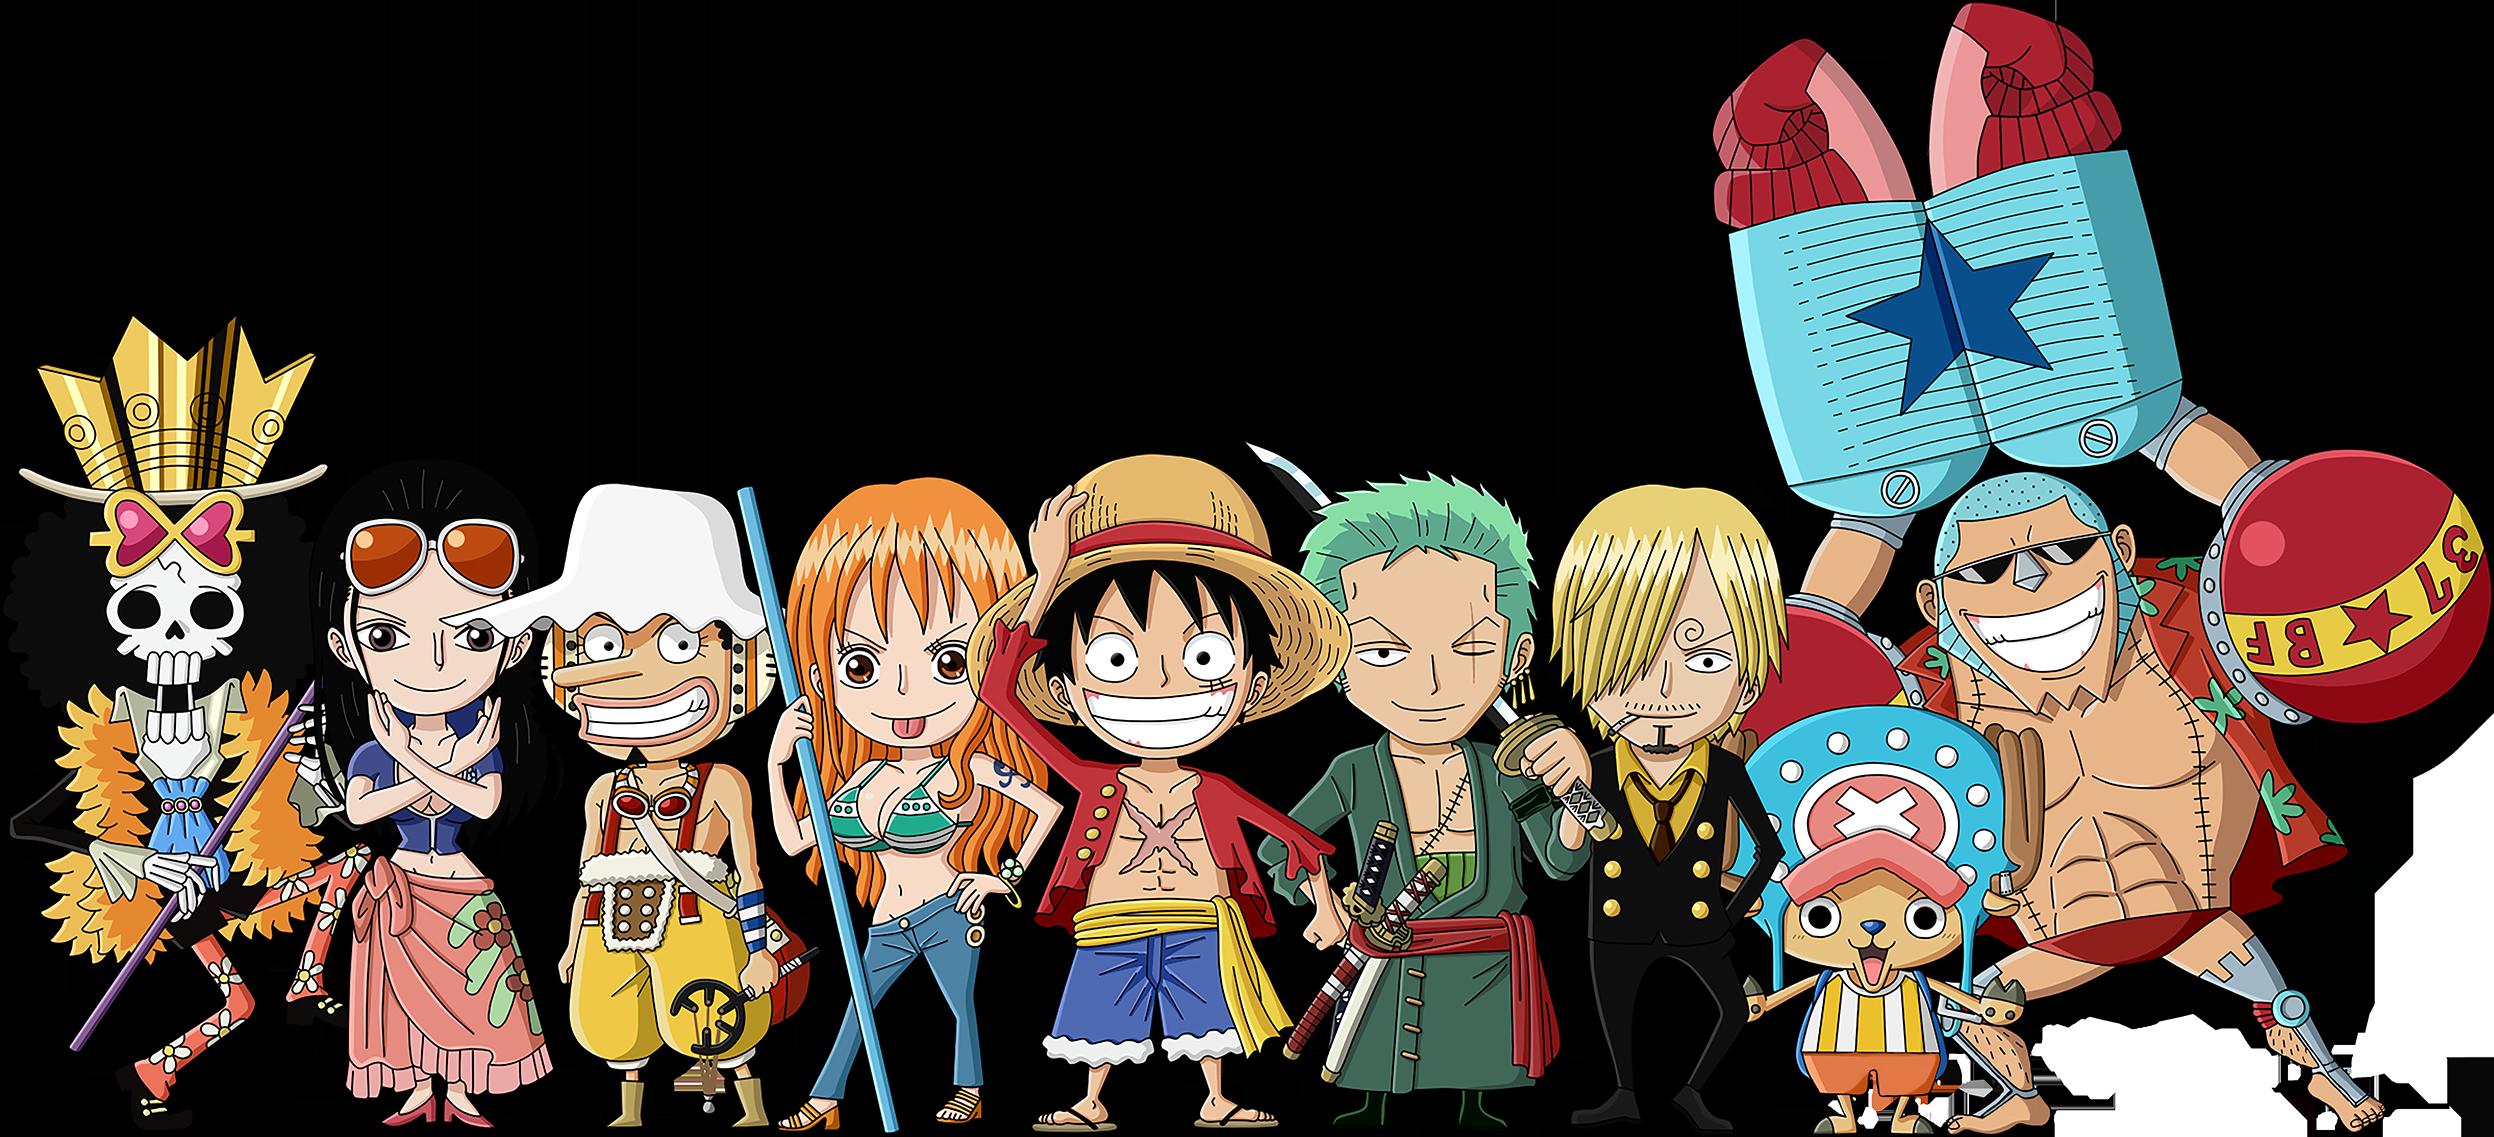 Pin by Rio Odestila on Anime, Animation, Cartoon Fans Art